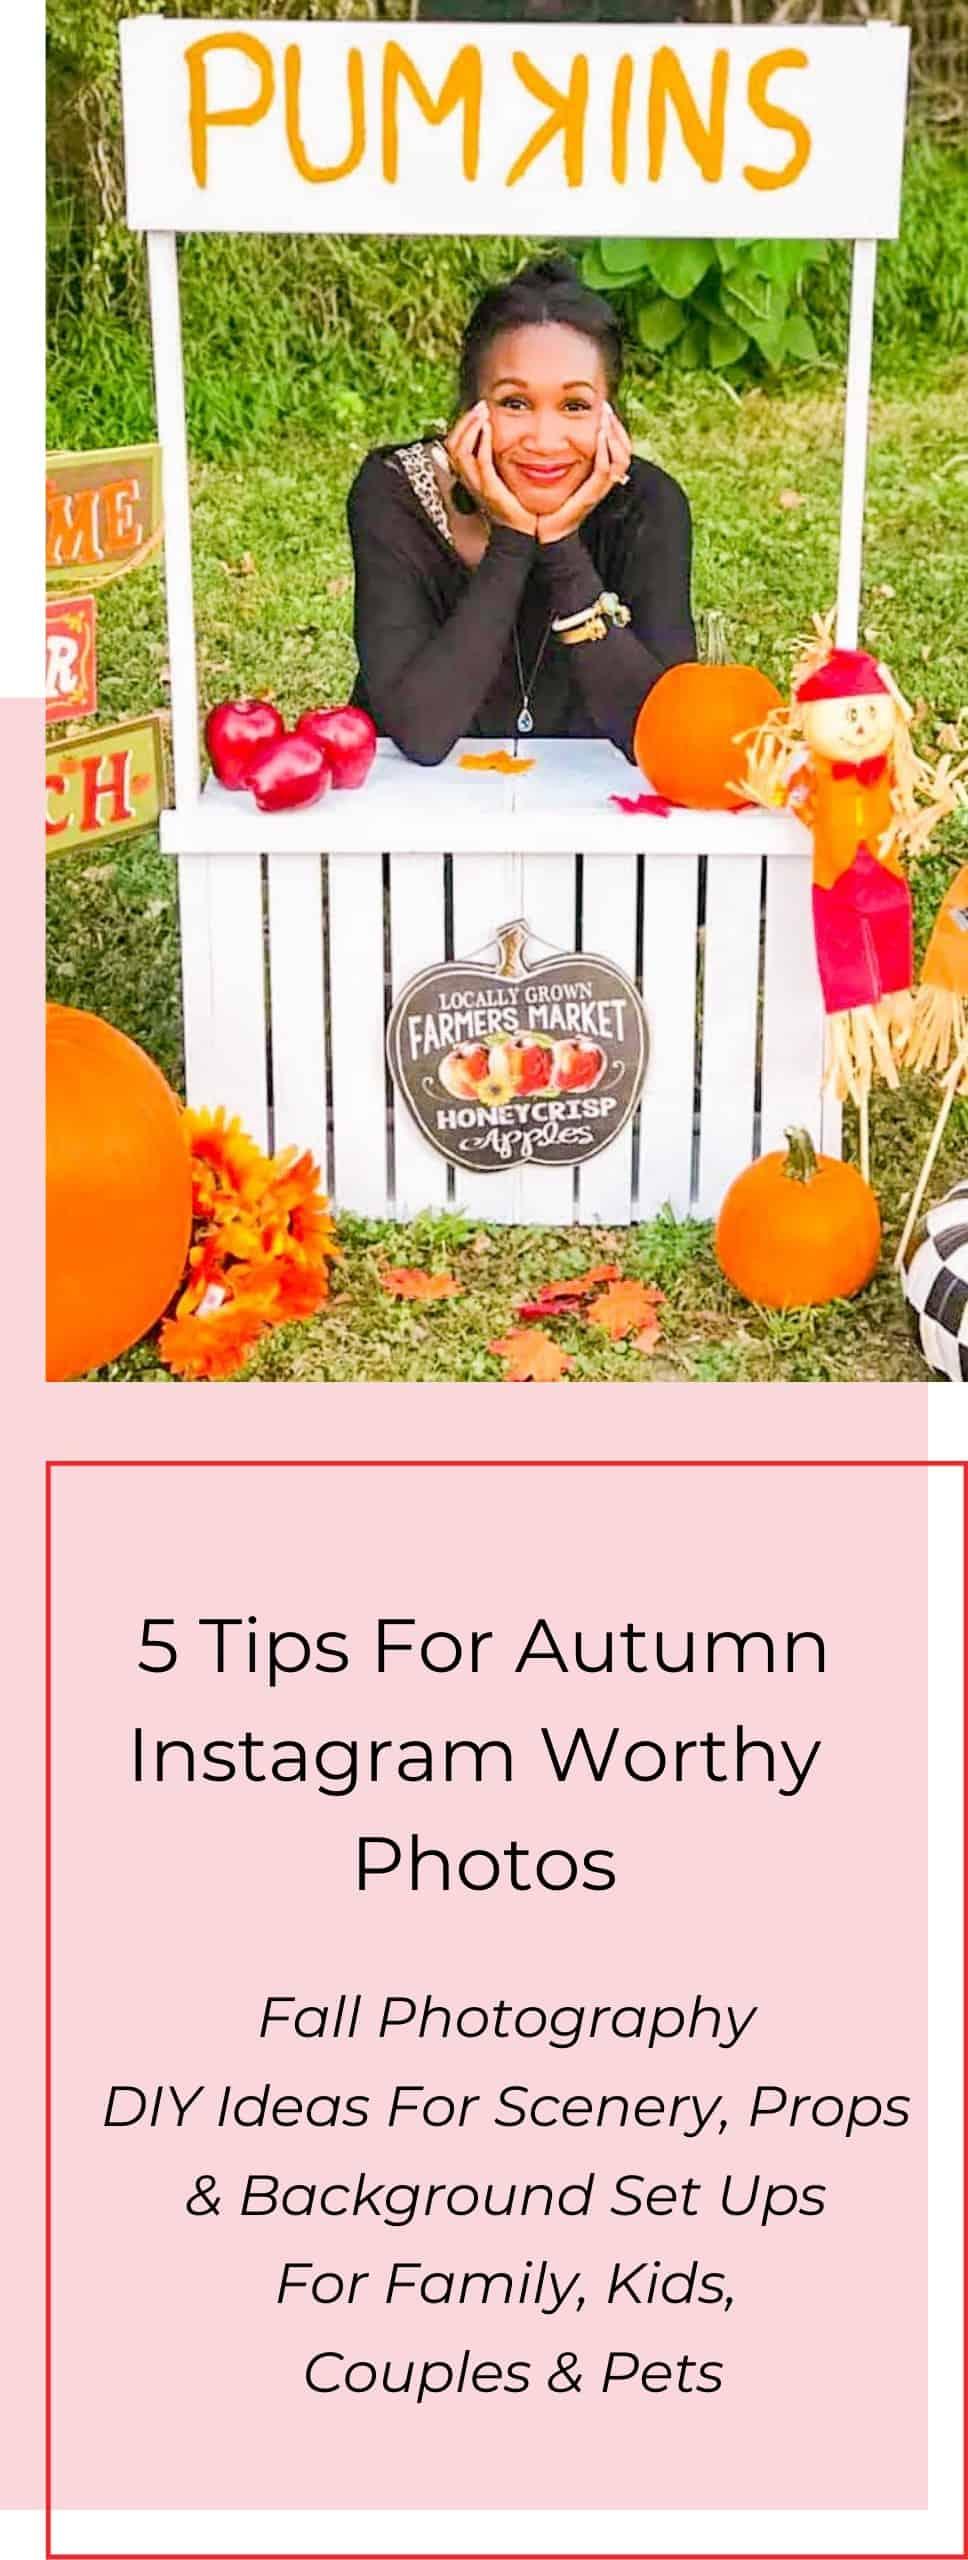 5 Tips For Autumn Instagram Worthy Photos